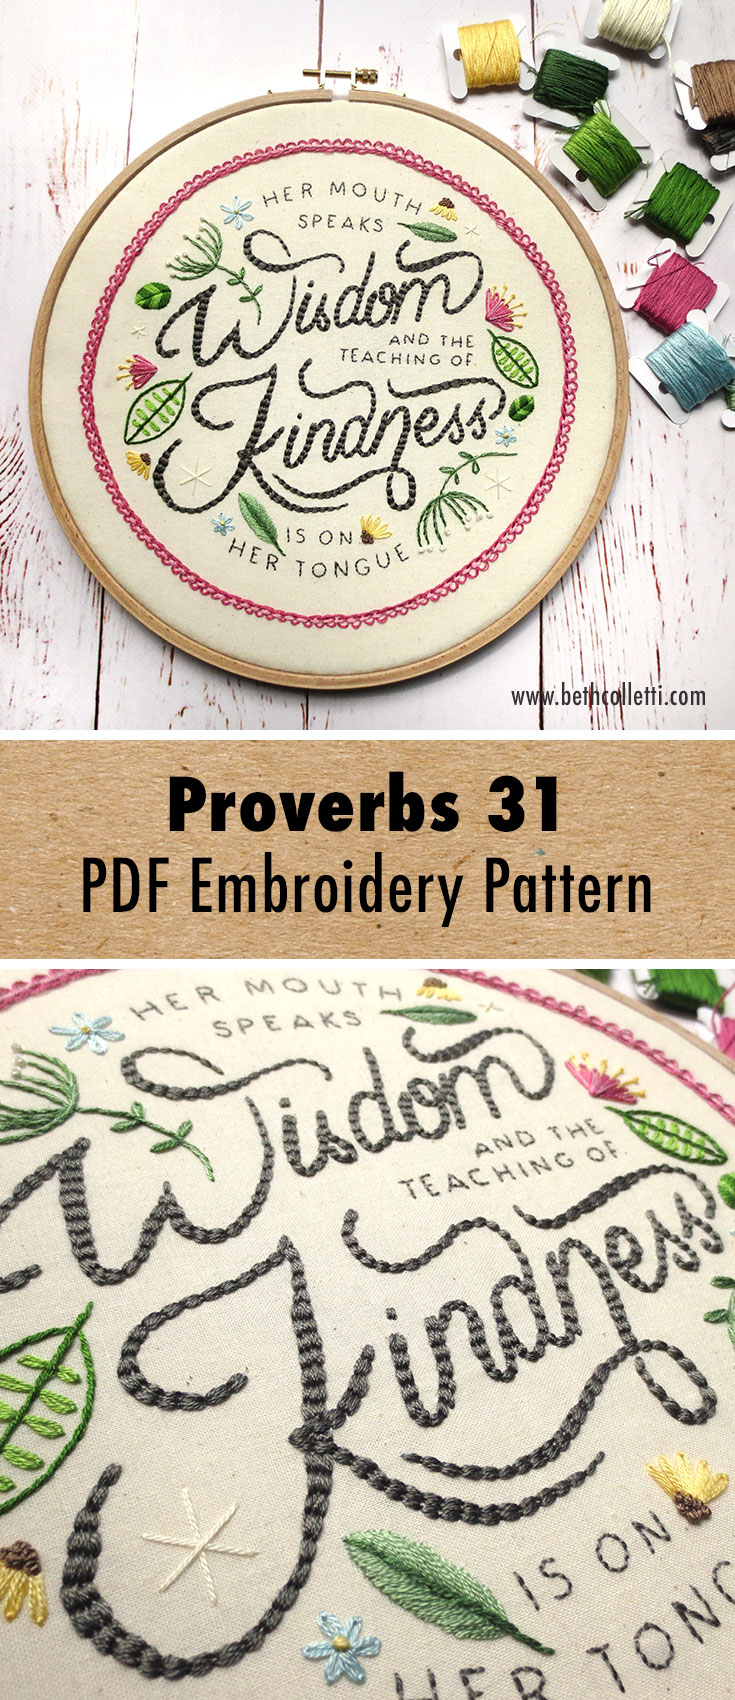 Proverbs 31 Stitchalong Embroidery Pattern